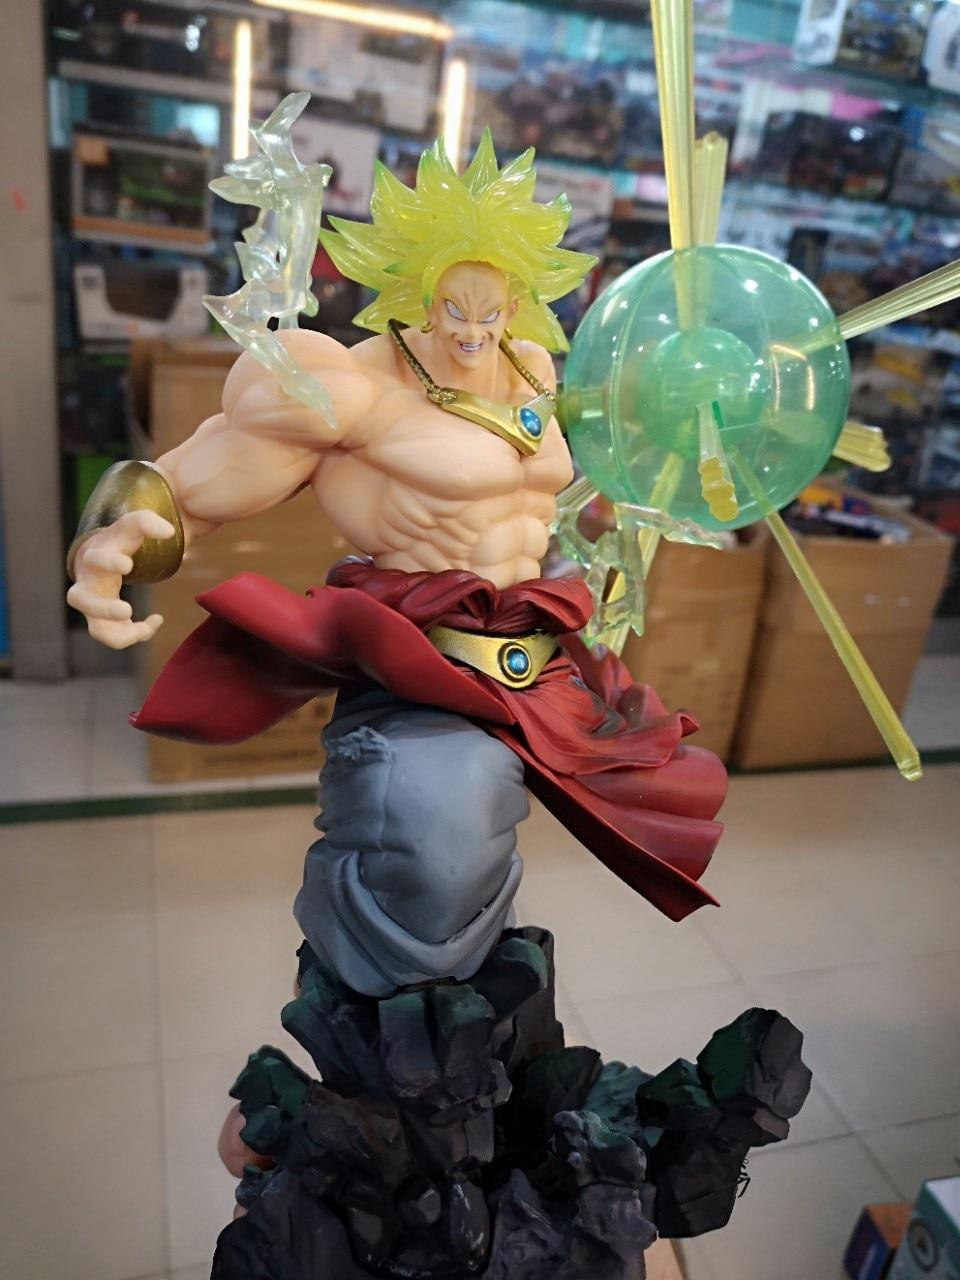 Новые горячие Dragon Ball Z фигурка F. ZERO Супер Saiyan Broli фигурку Broly ПВХ 32 см - 2